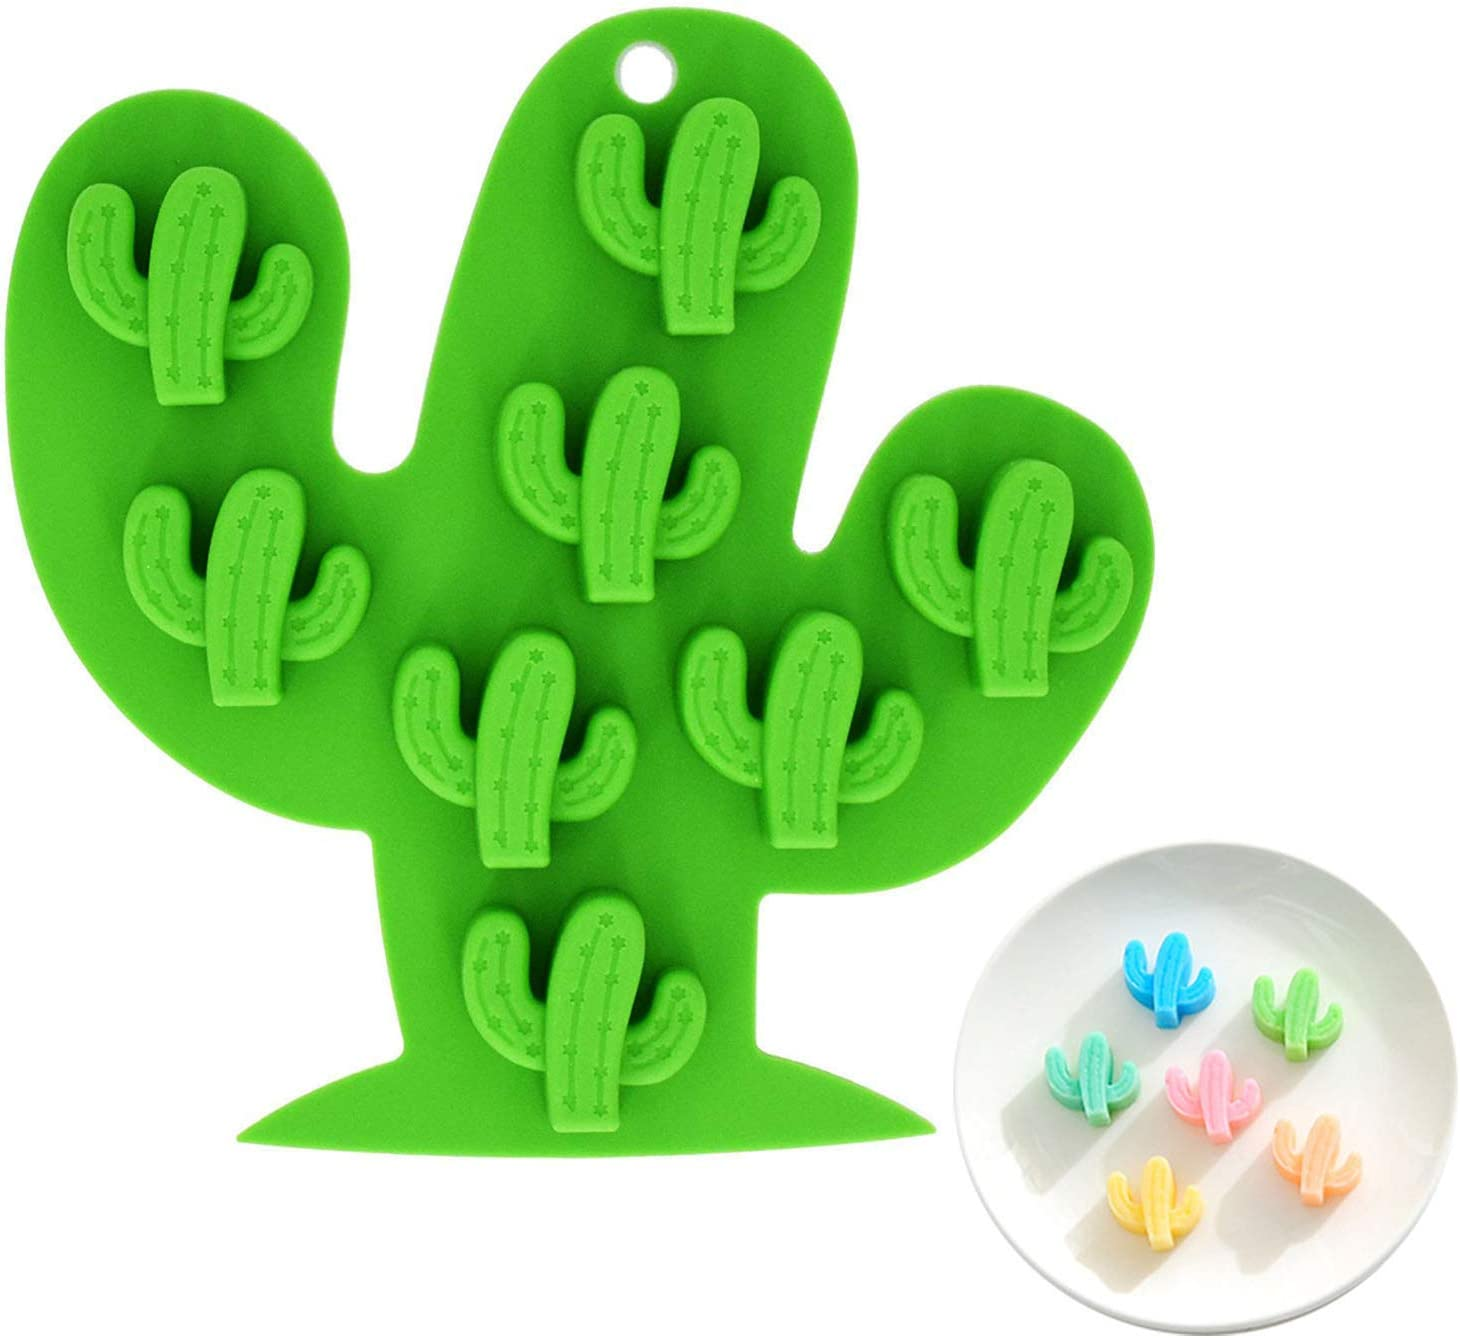 Fewo 8-Cavity Small Size Cactus Ice Cube Tray, Food-grade Silicone Mold for Chocolate, Candy, Cookie, Fondant, Jello, Mini Soap, Baking, Bath Bomb, Candle